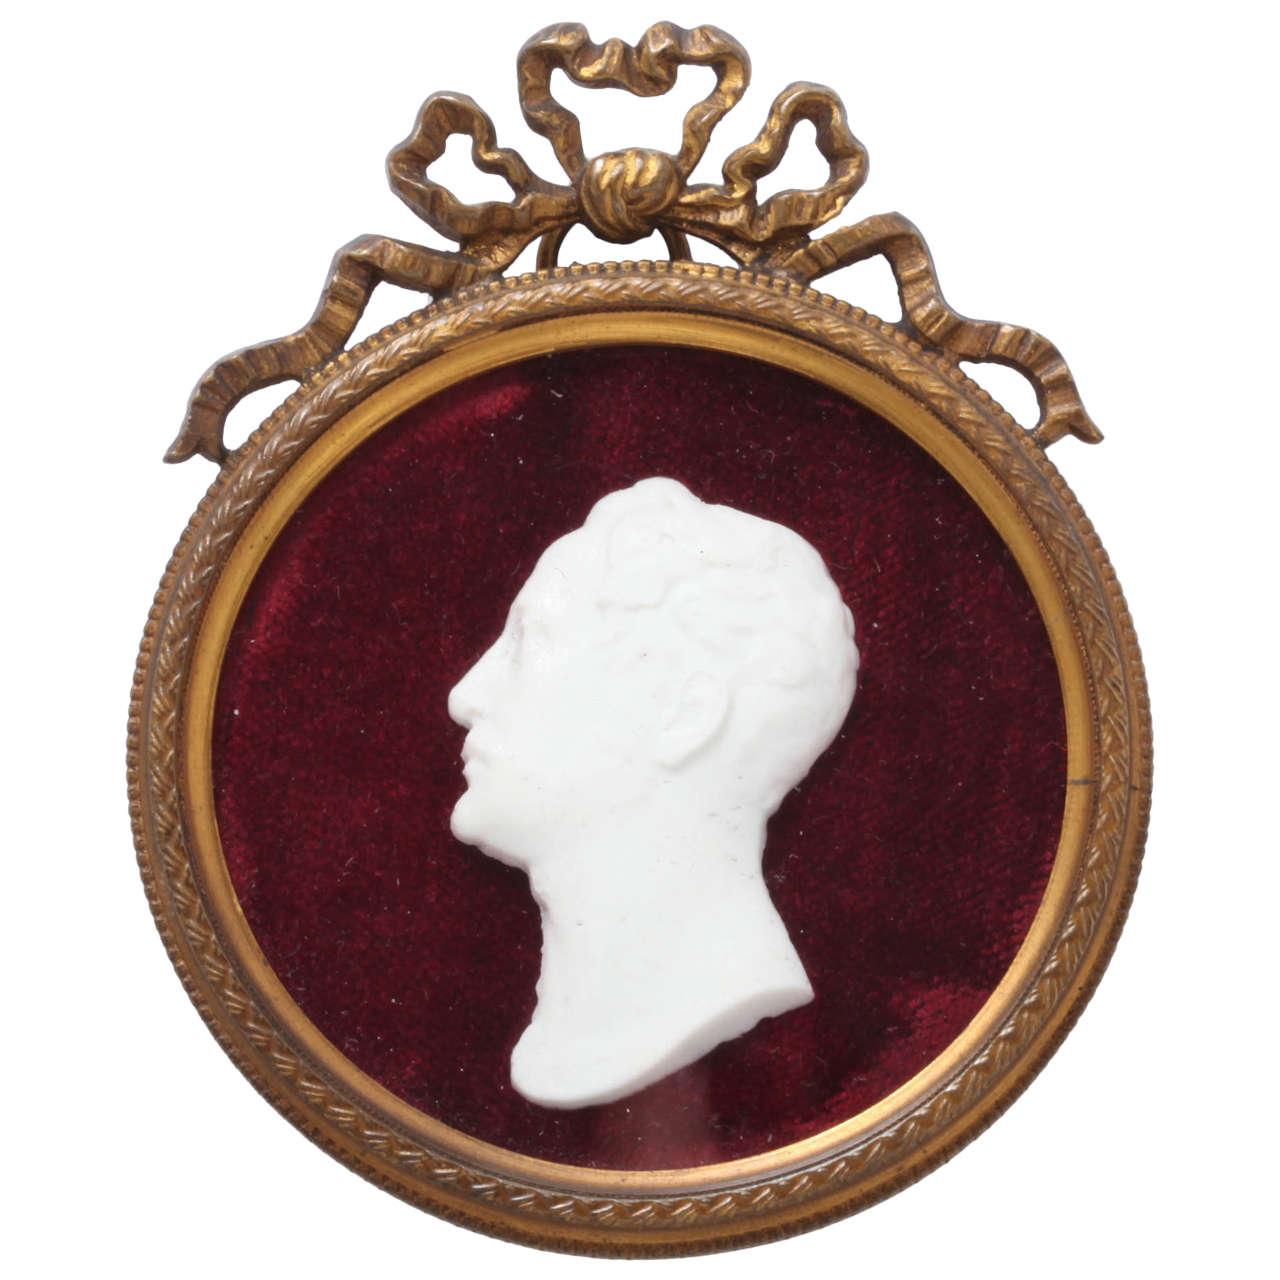 Tsar Nicholas I Bisque Porcelain Portrait, Circa 1825 1